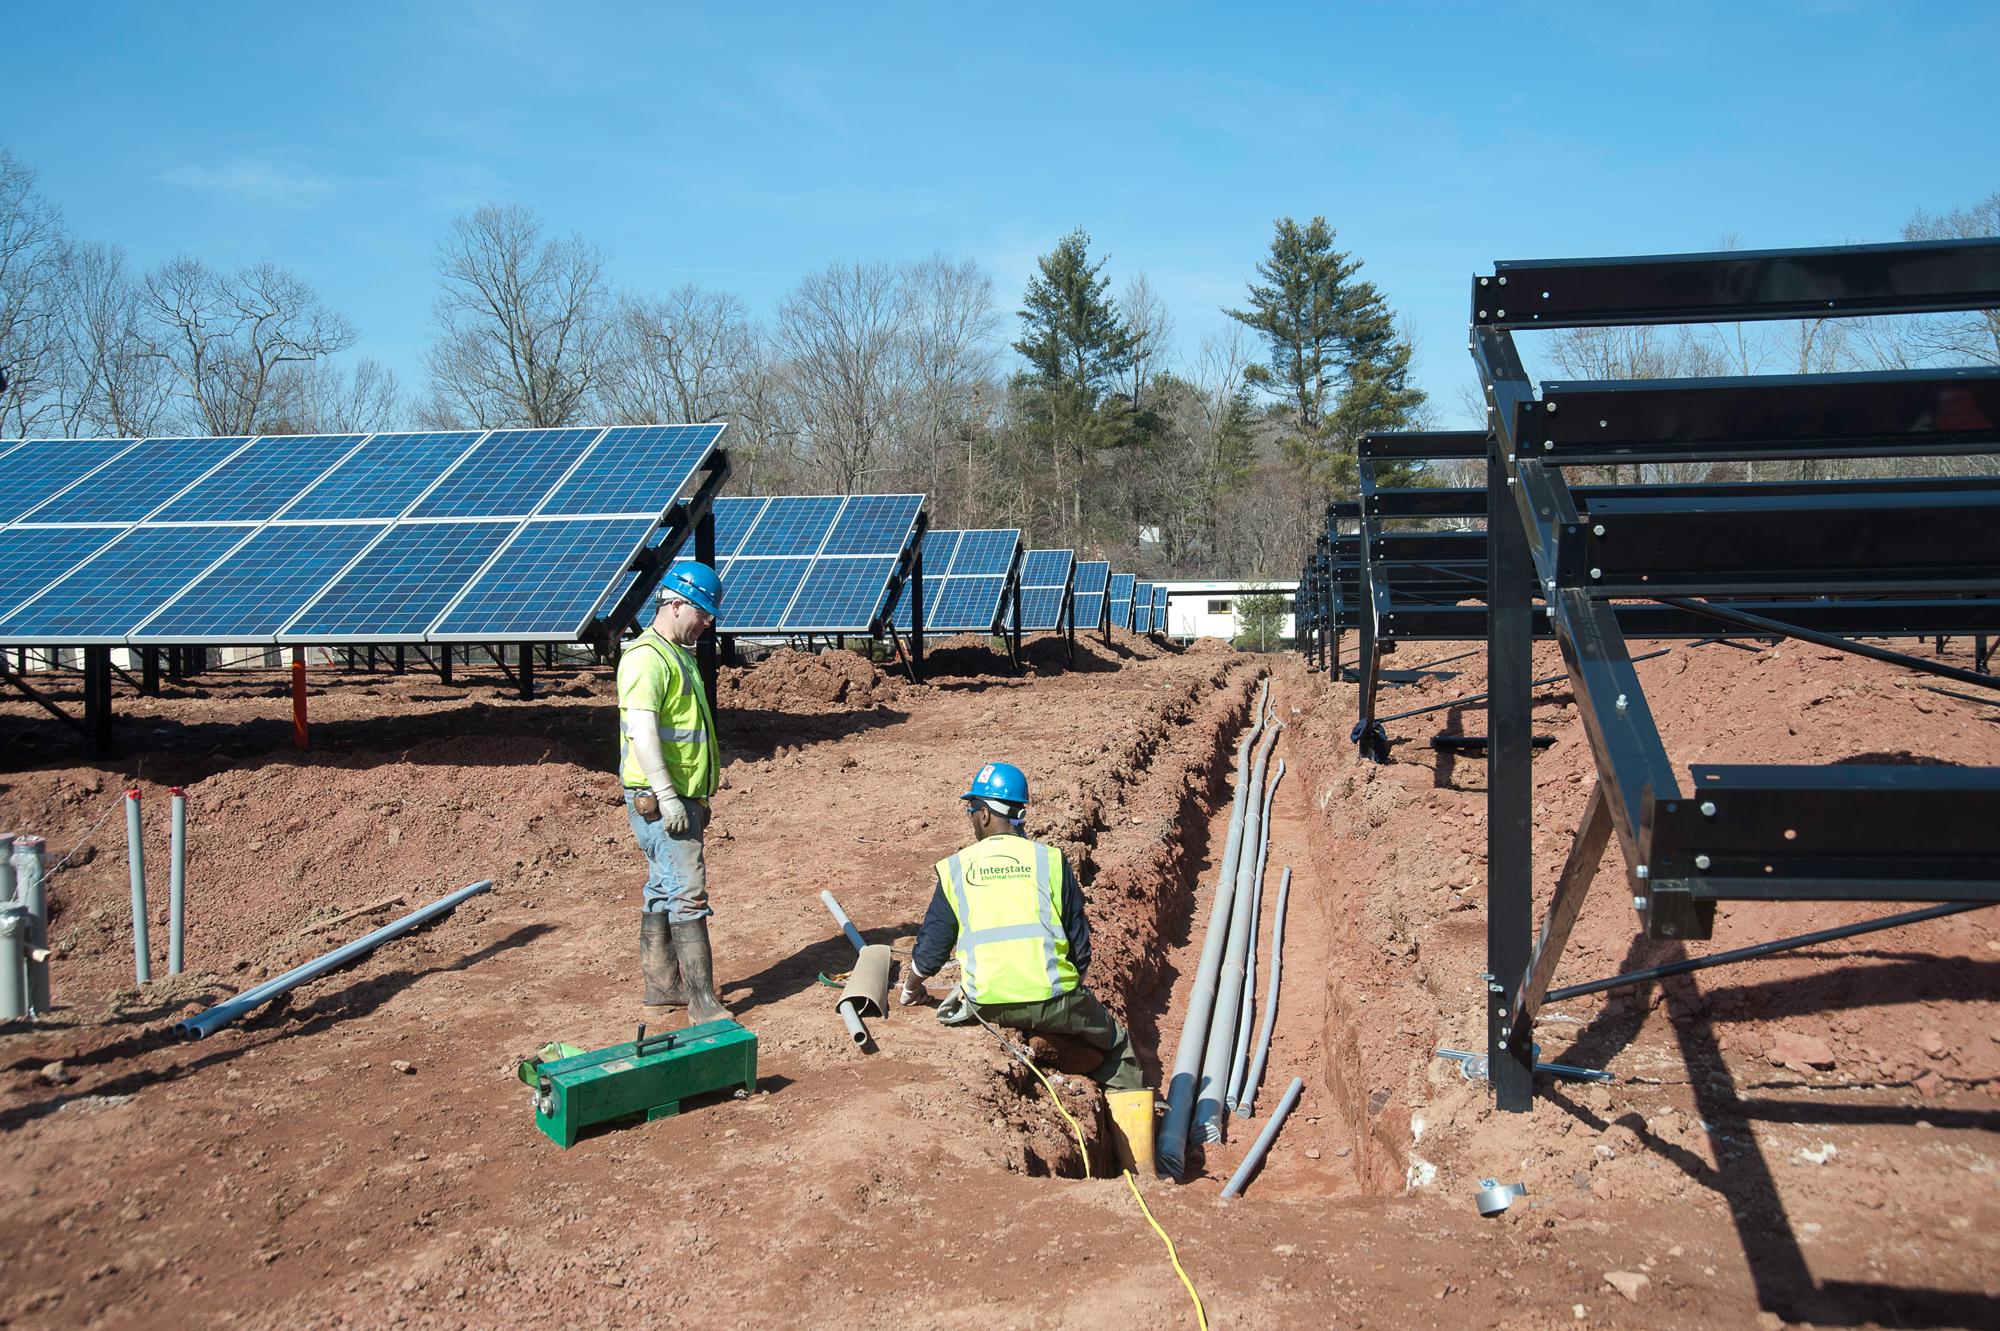 Solar Panel installation photograph